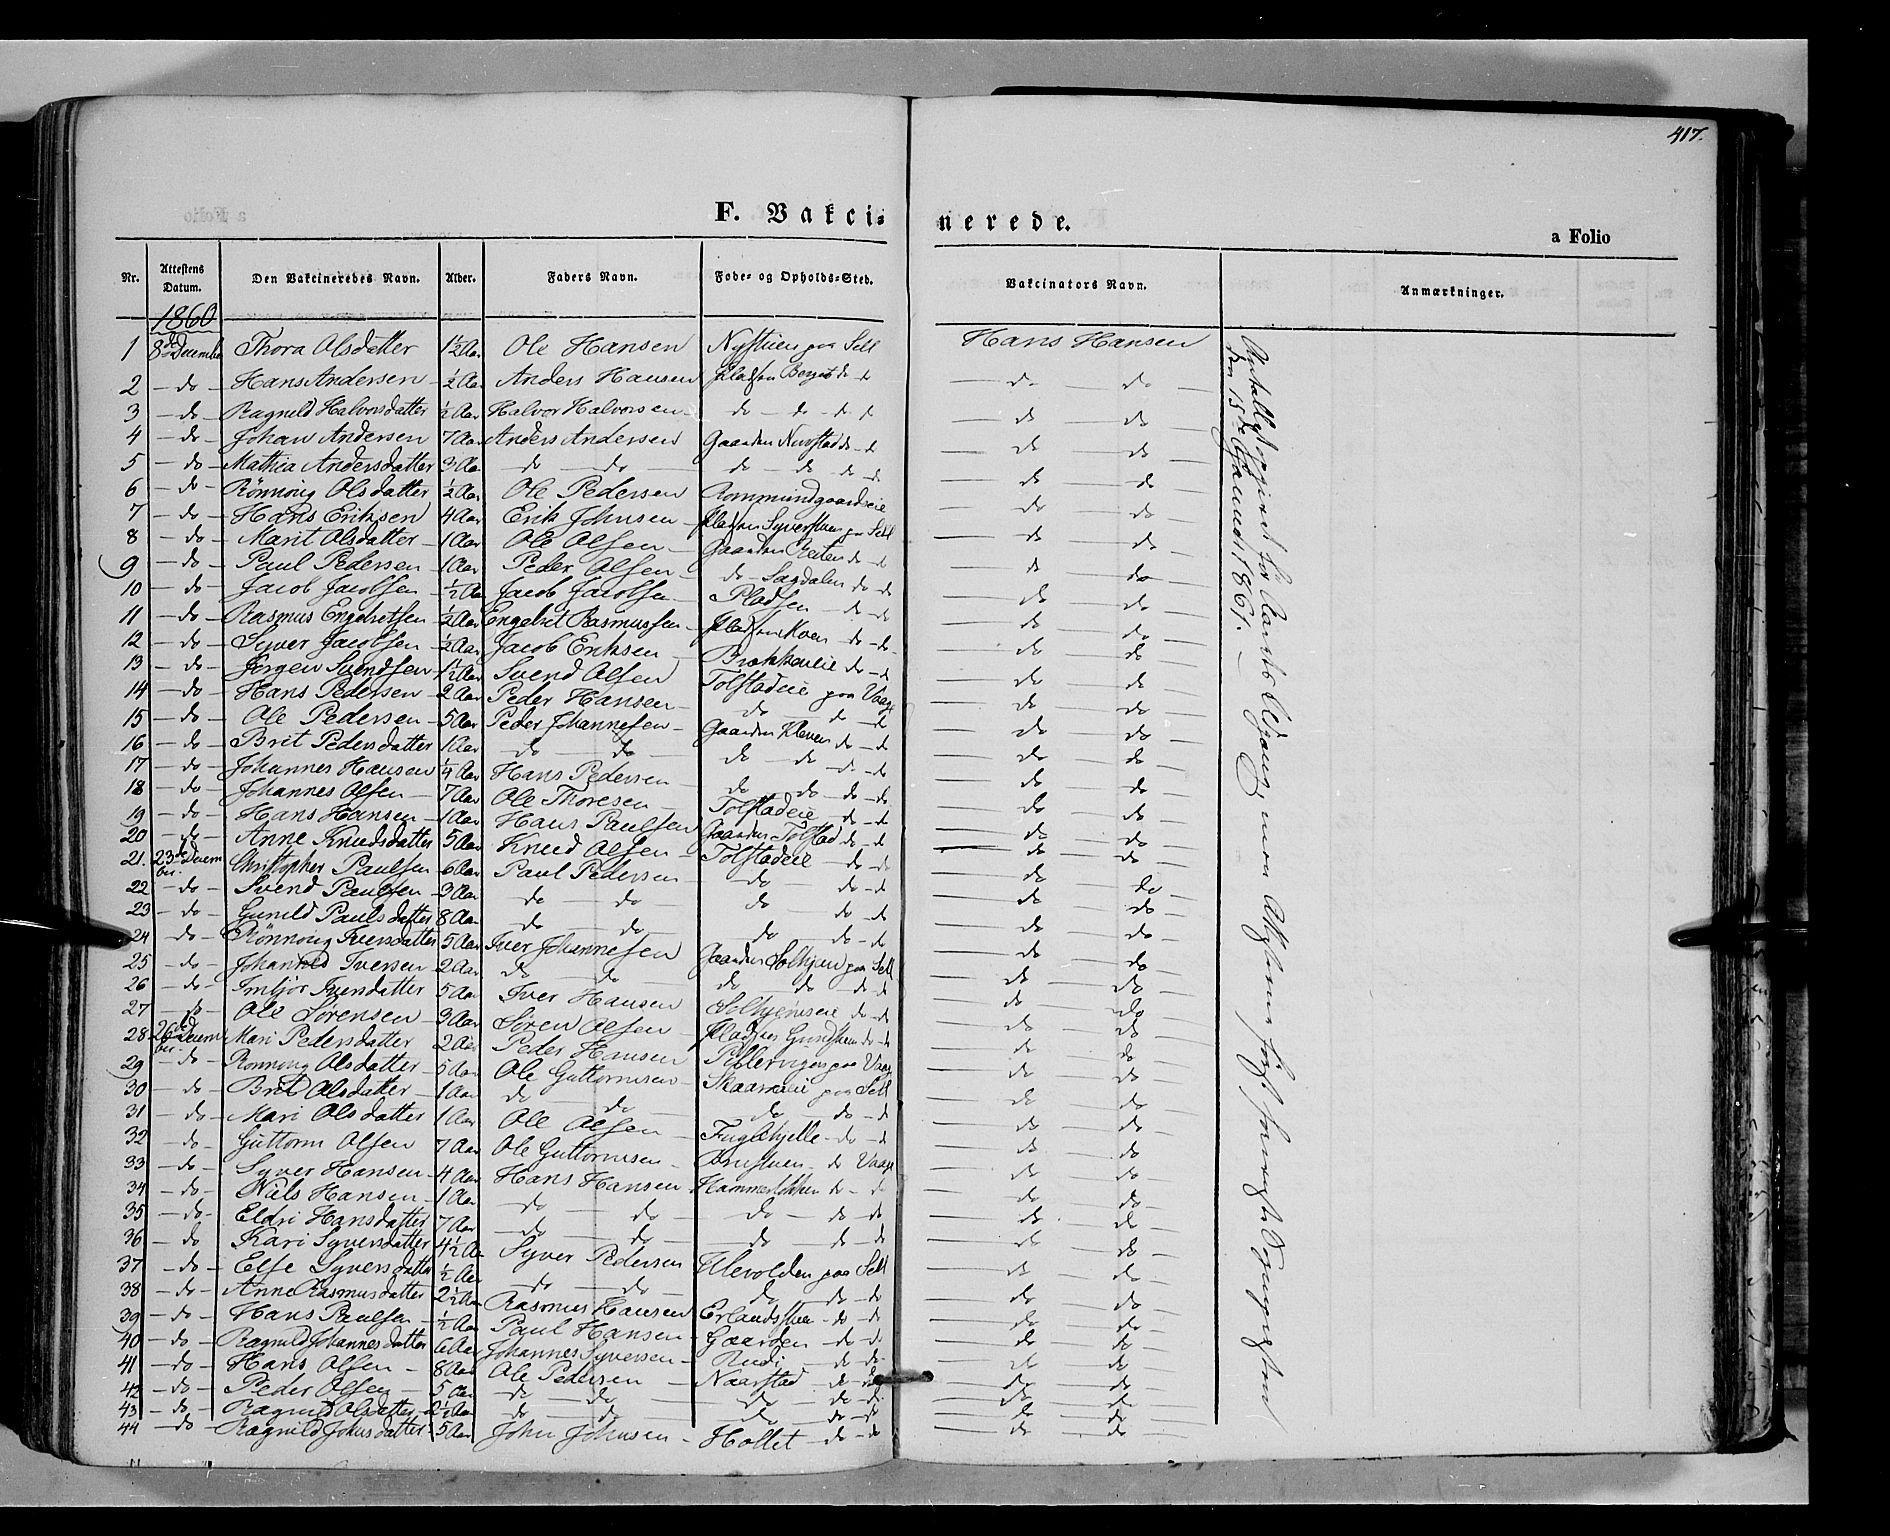 SAH, Vågå prestekontor, Ministerialbok nr. 6 /1, 1856-1872, s. 417